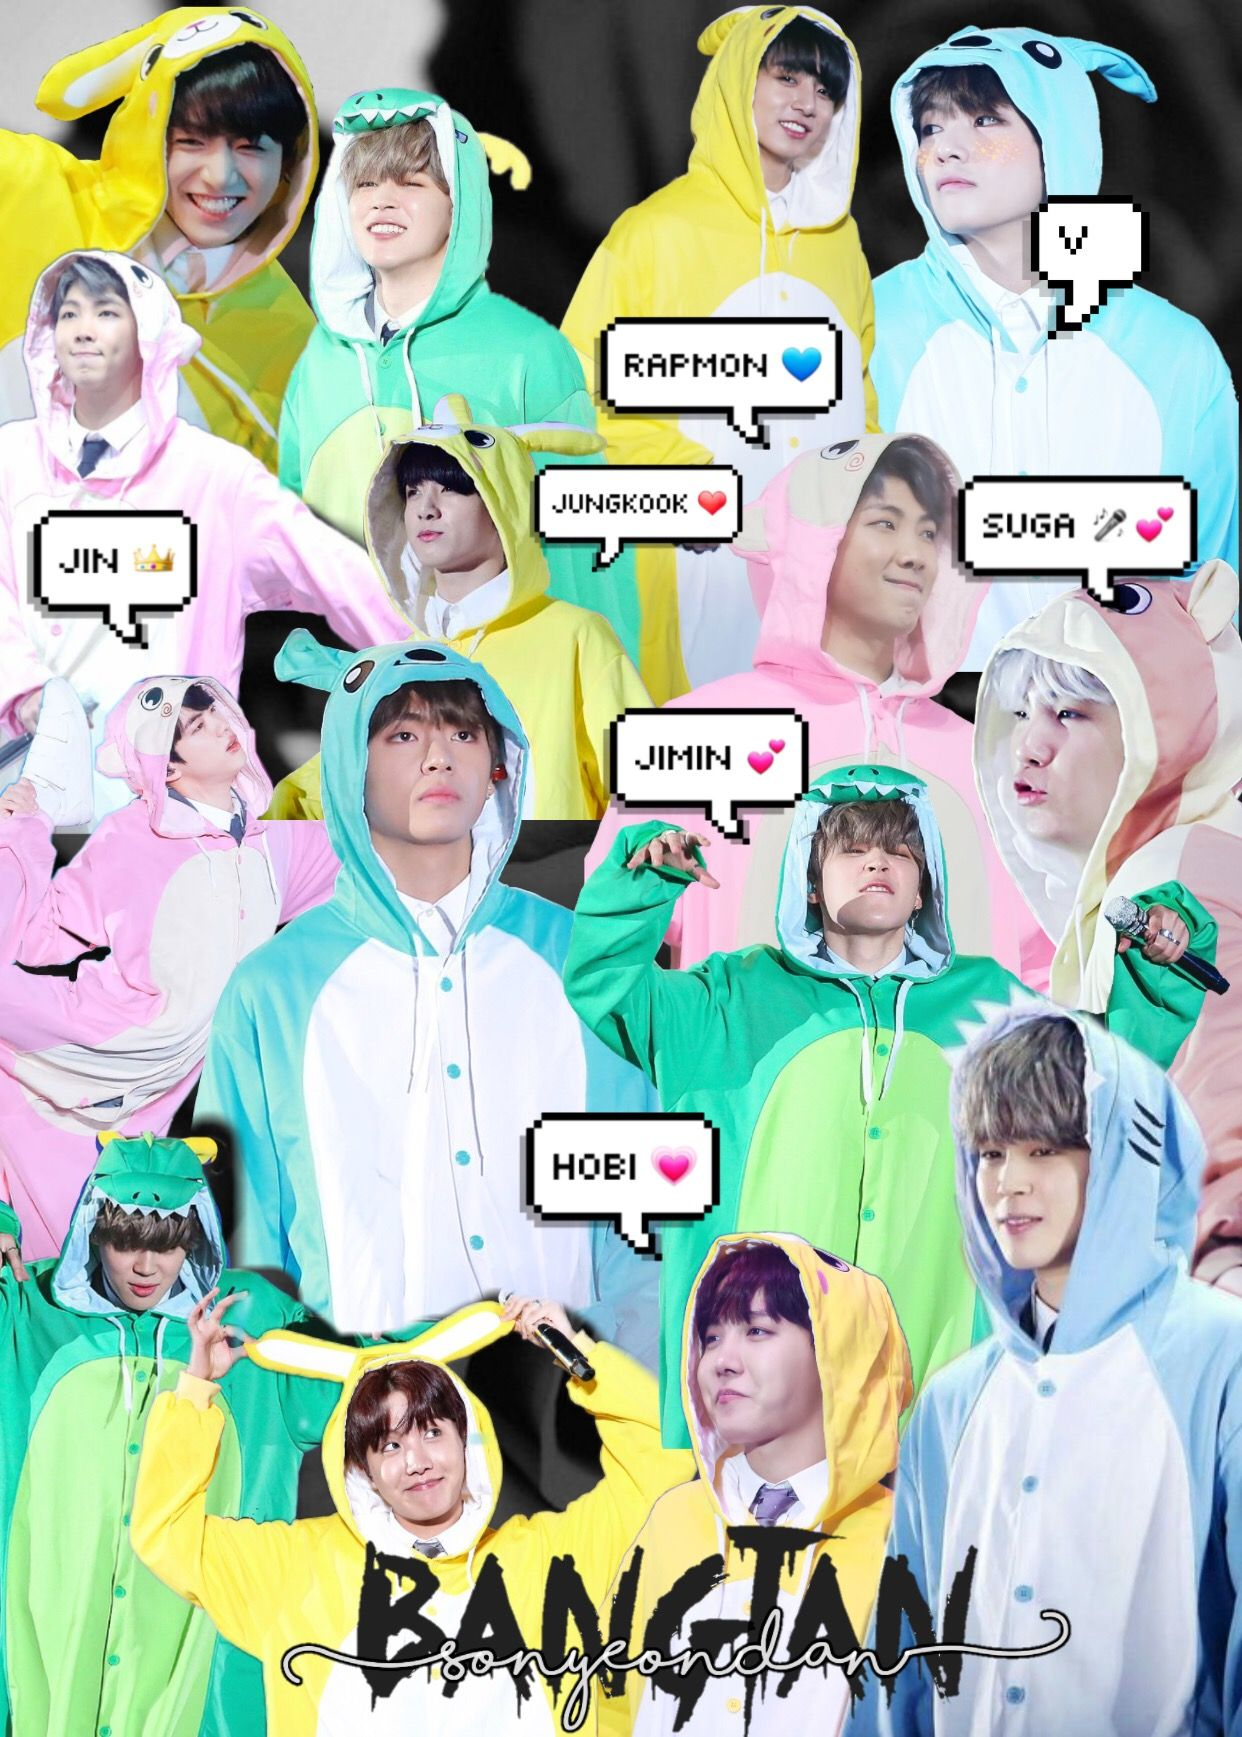 Bts In Onesies Bts 4thmuster 2018 Cute Bts Pictures Bts Wallpaper Jungkook Bts cute memes wallpaper